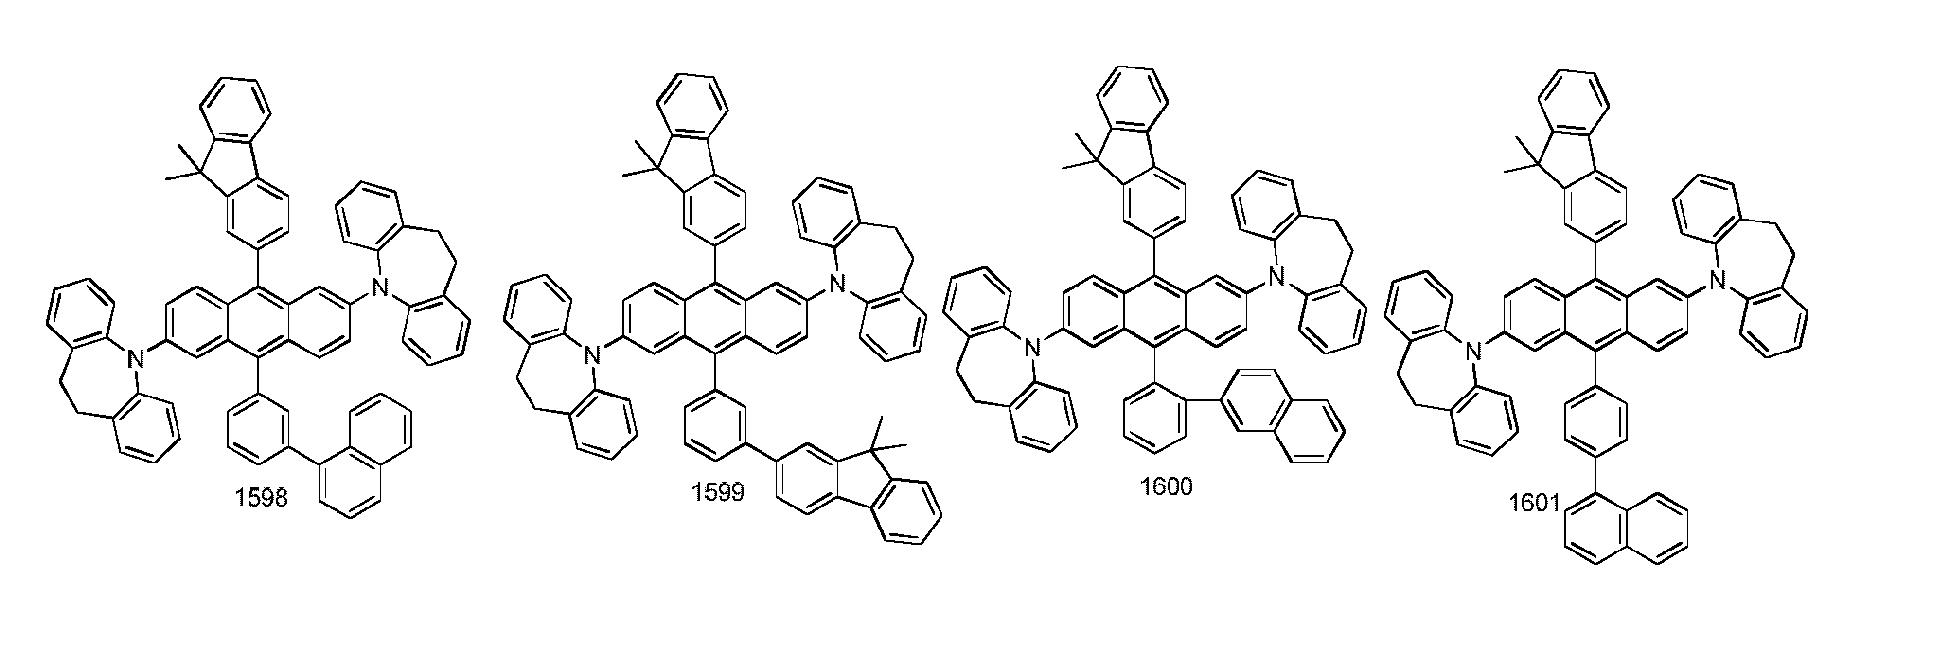 Figure imgb0258